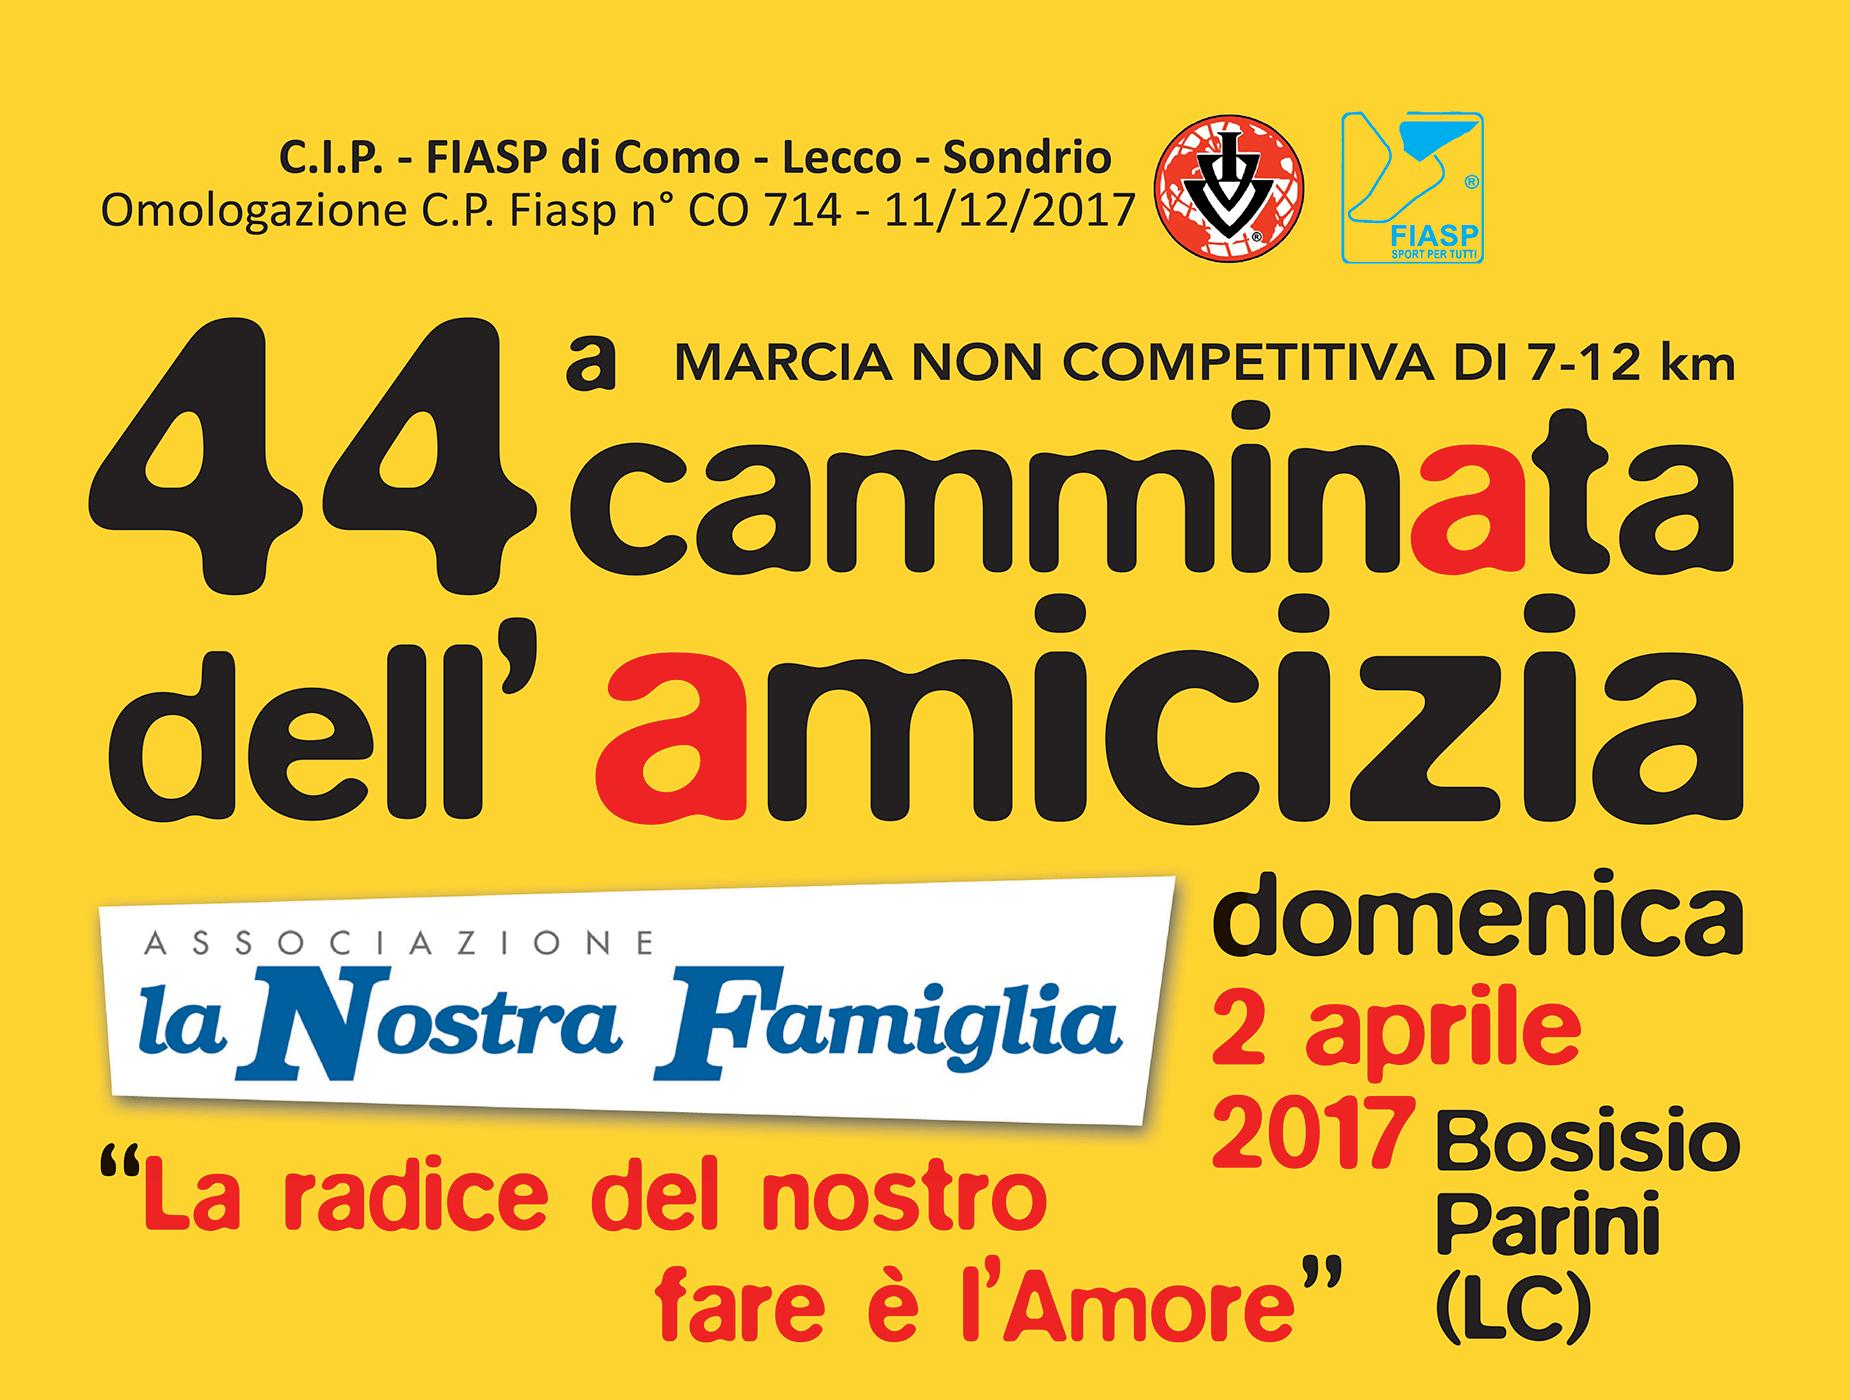 http://www.lanostrafamiglia.it/images/news/testata_camminata.jpg